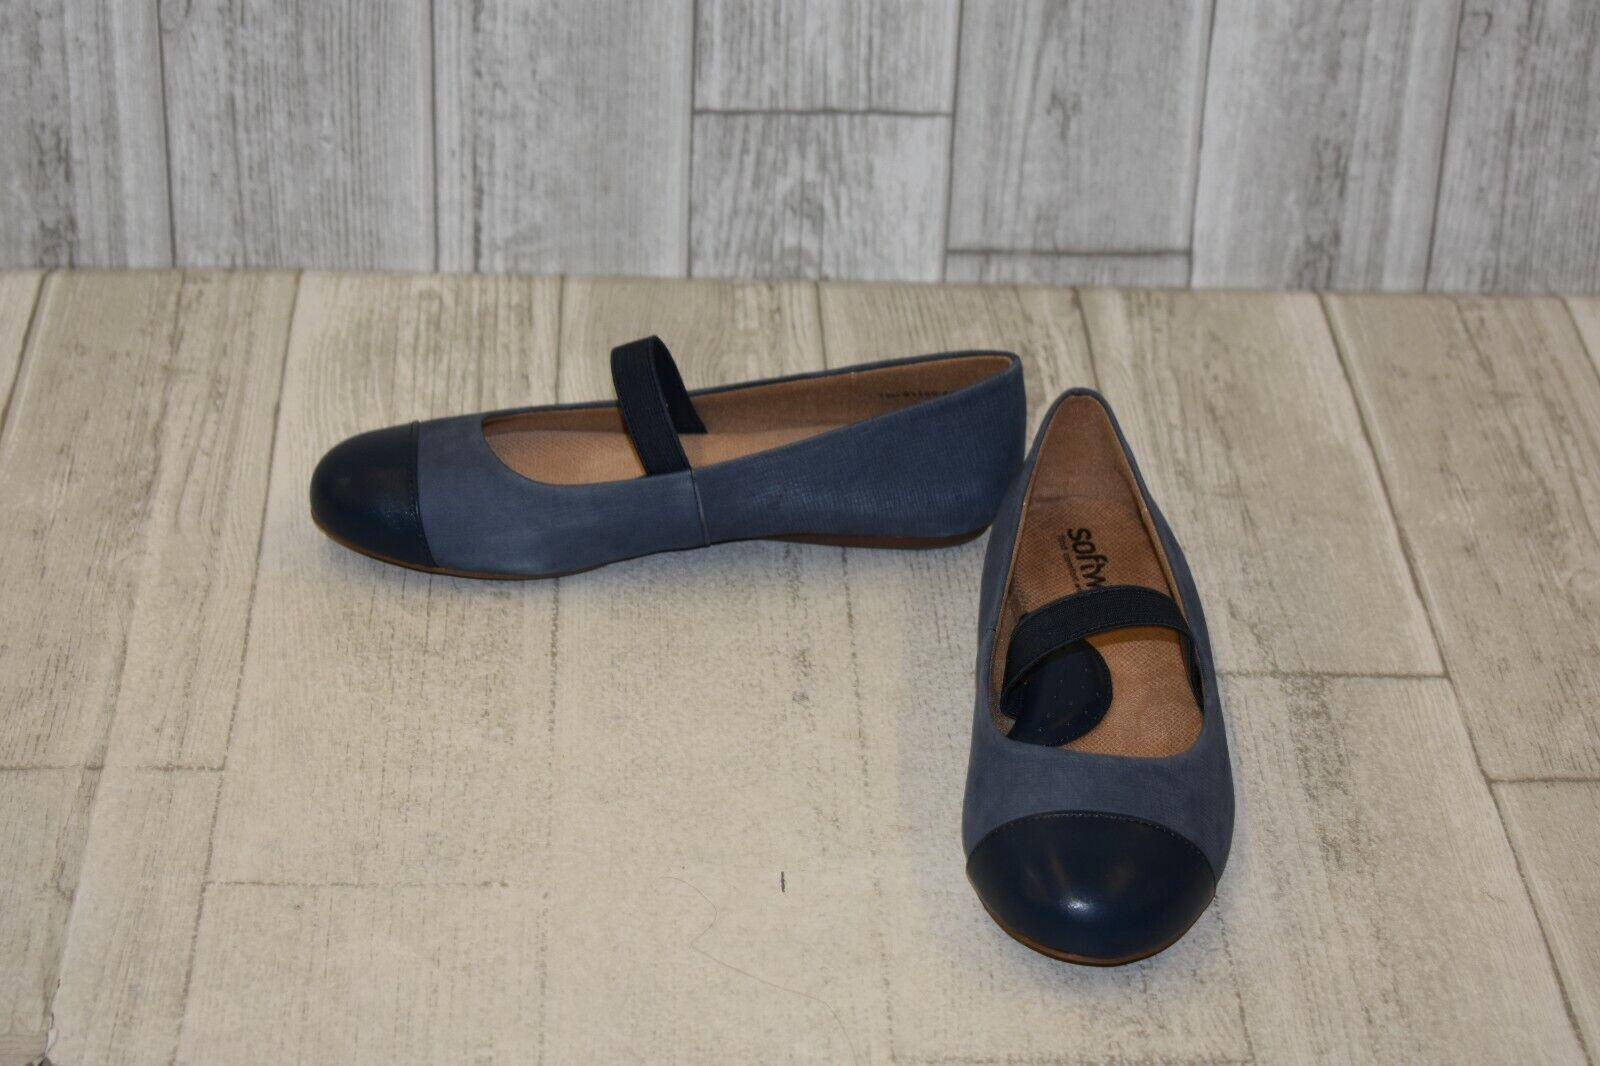 SoftWalk Women's Napa Mary Jane Flat - Denim Jeans Dark bluee - Size 7.5 M